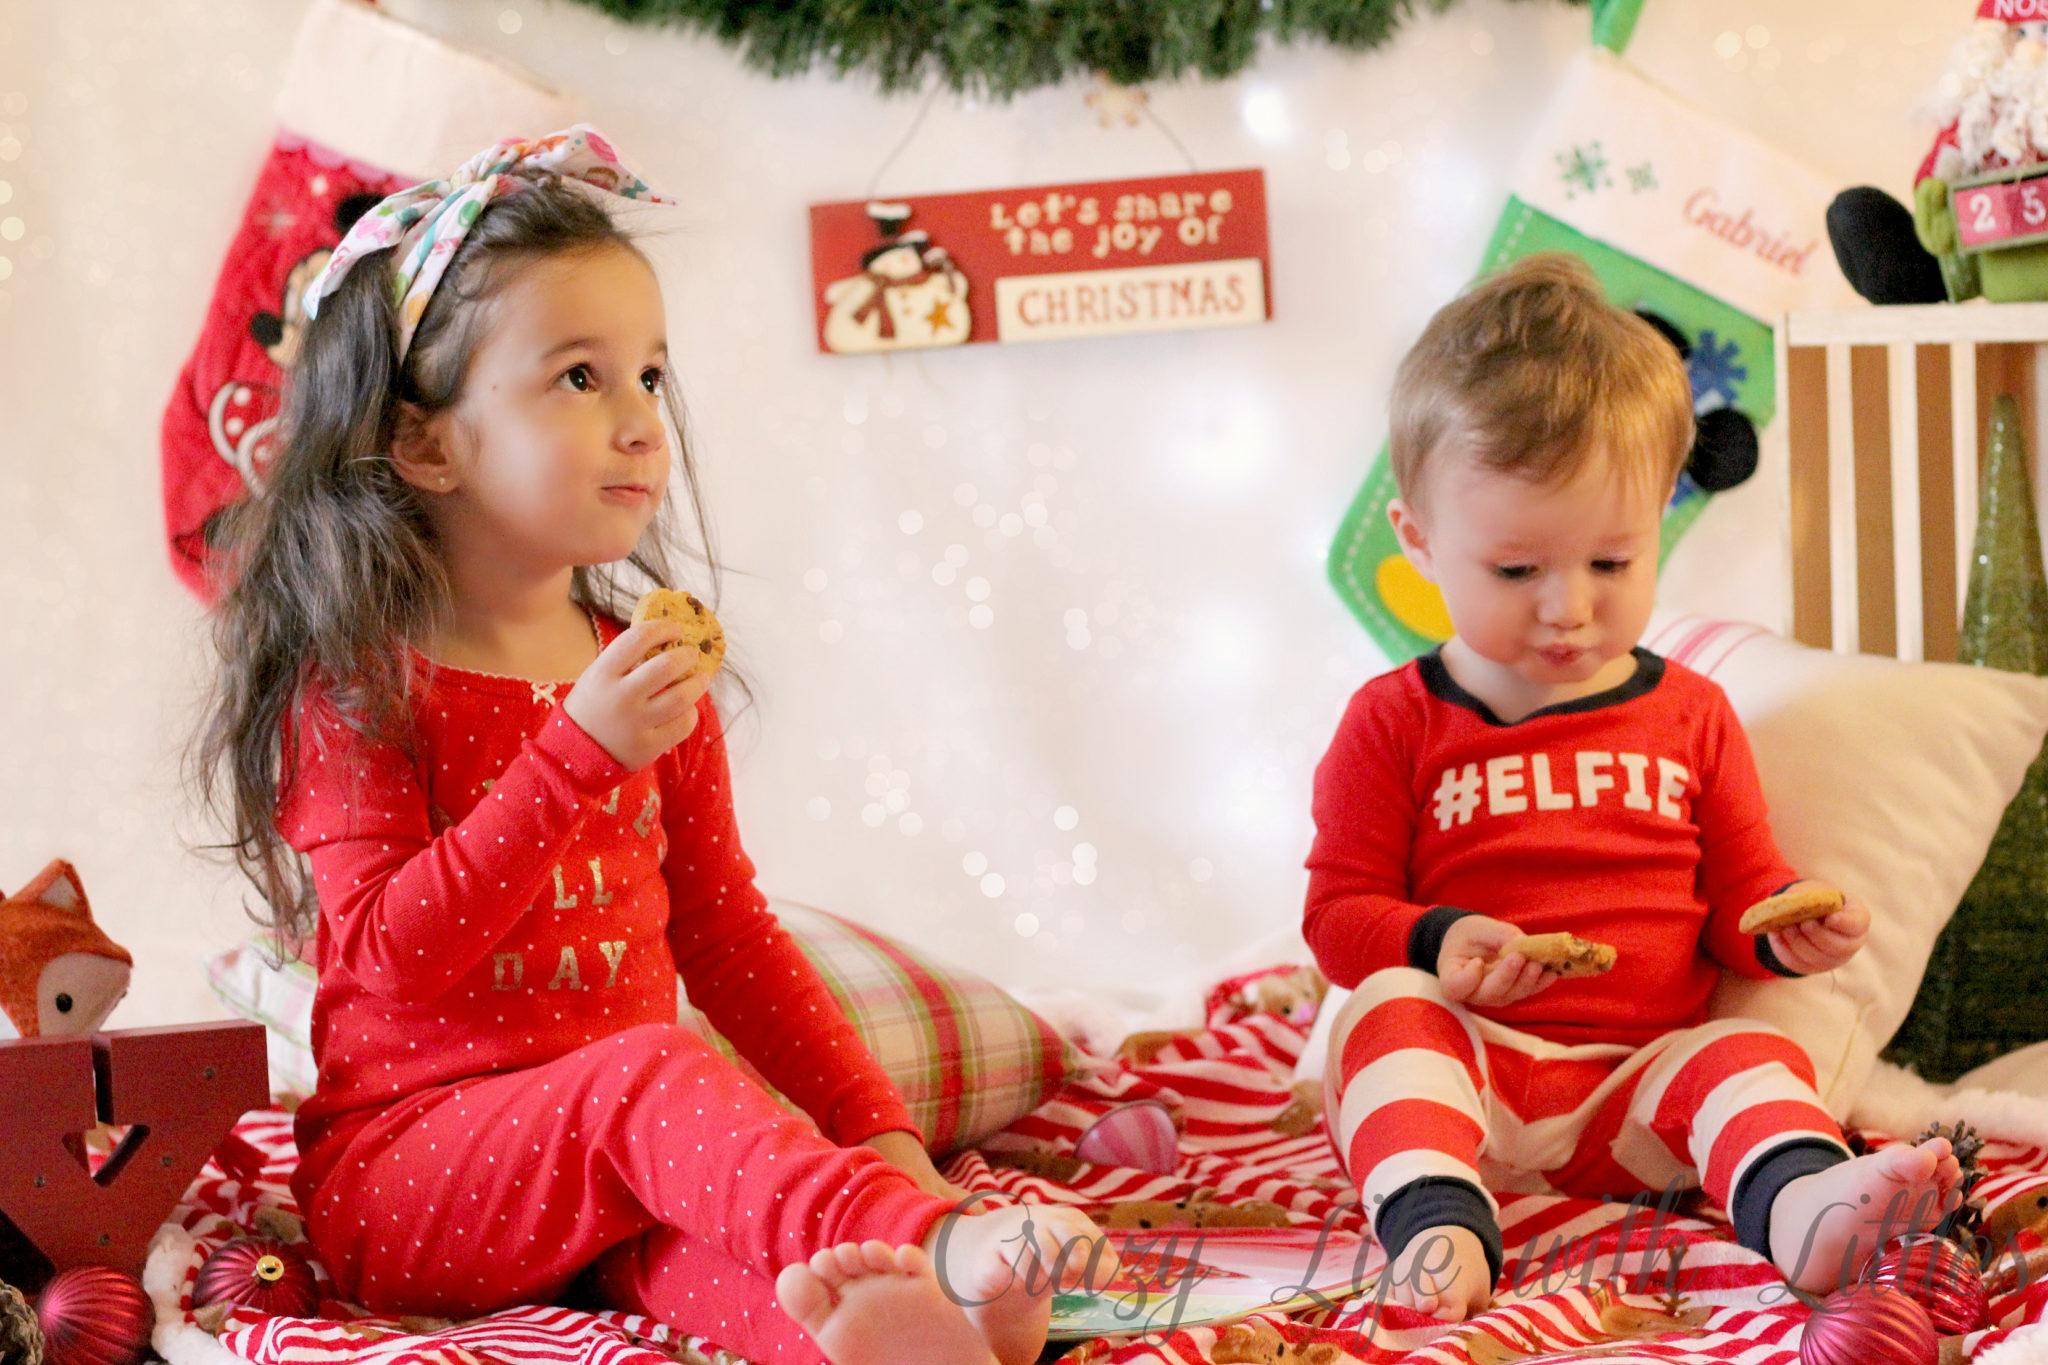 The Best Kids Fashion for the Holiday Season with OshKosh B'gosh